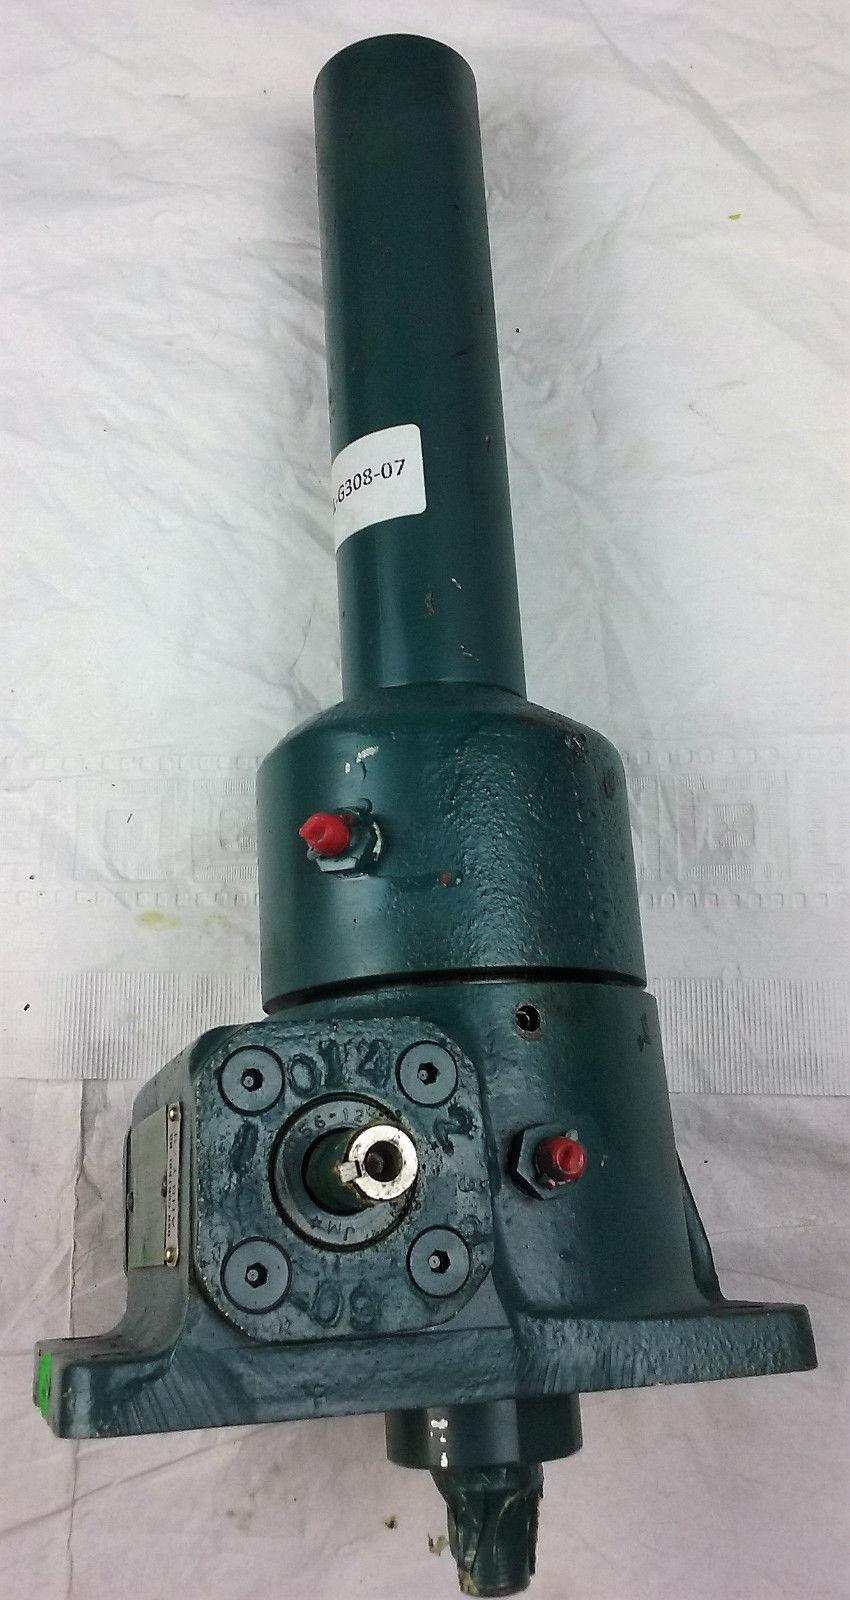 Screw Jack Limitorque Corporation Powr Jac 21/2BSJ-I image 6